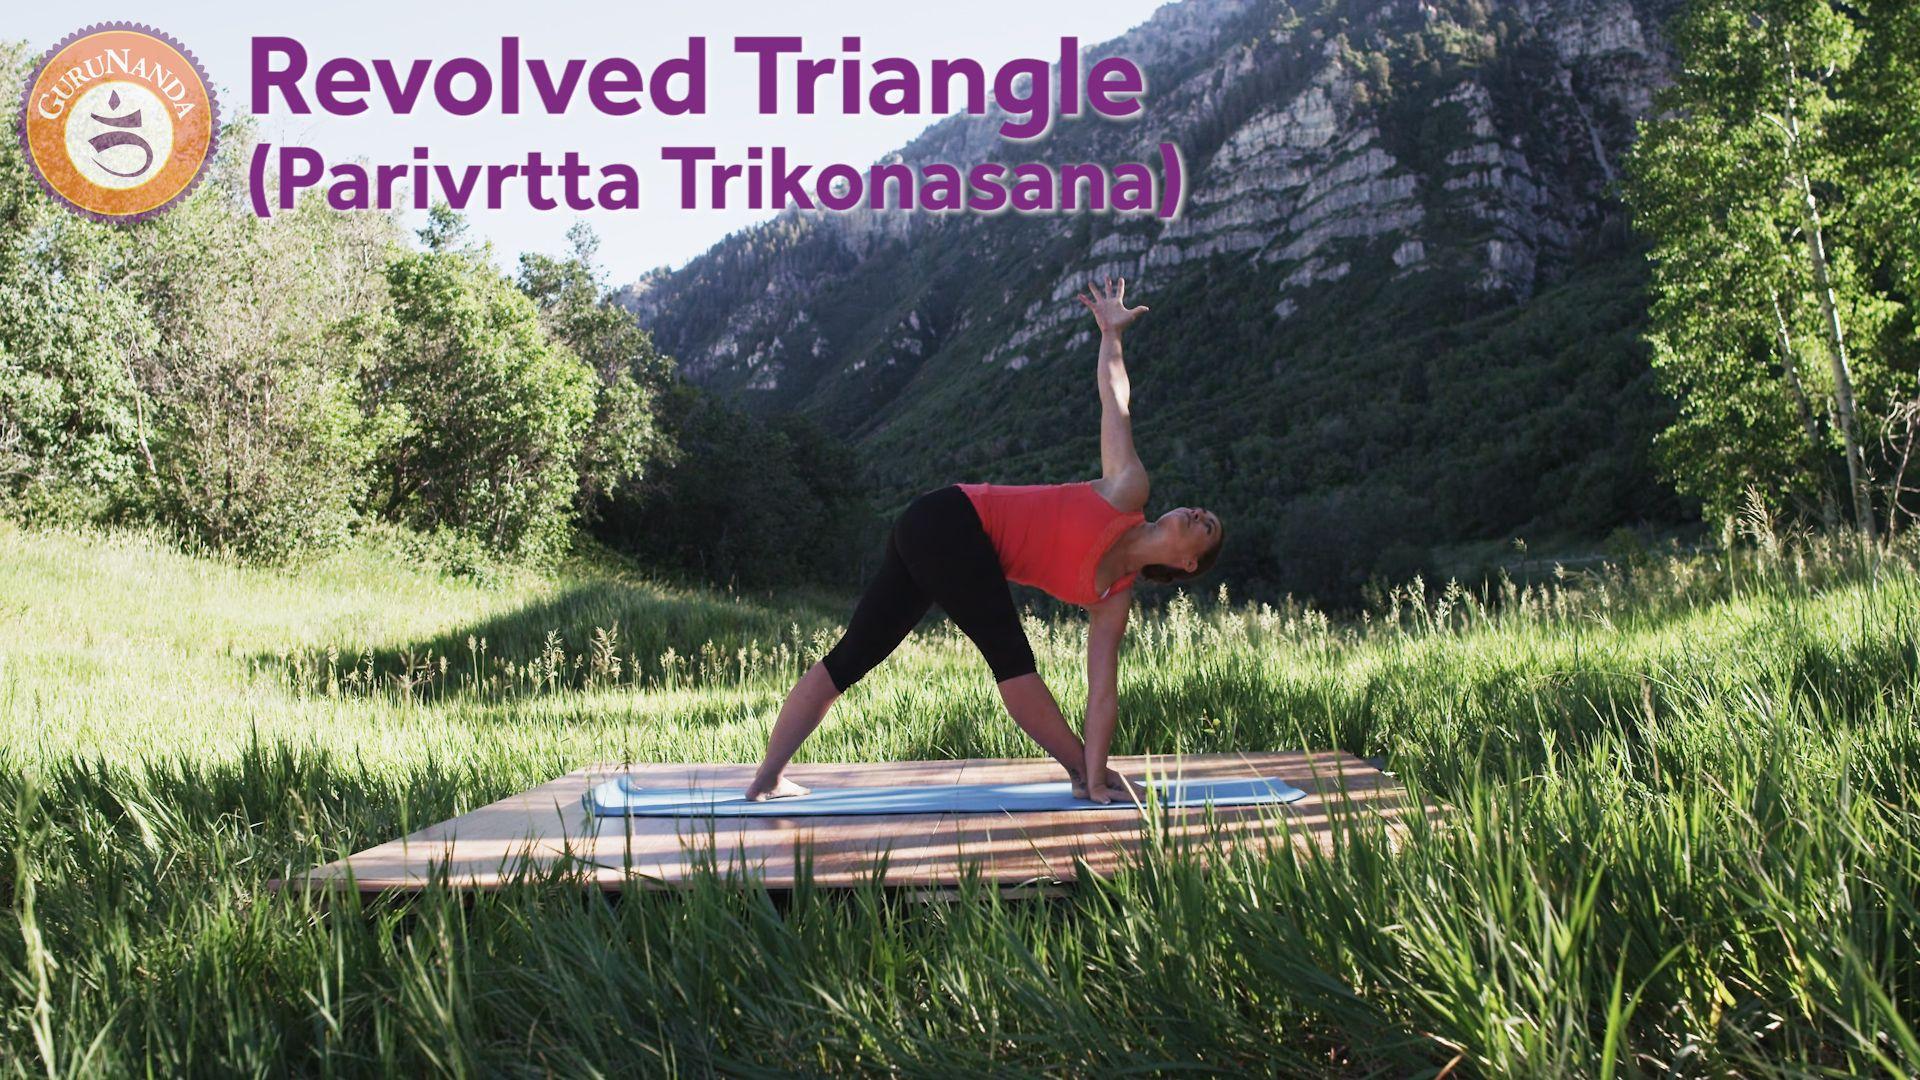 Yoga Poses Videos Gurunanda Poses Yoga Poses Yoga